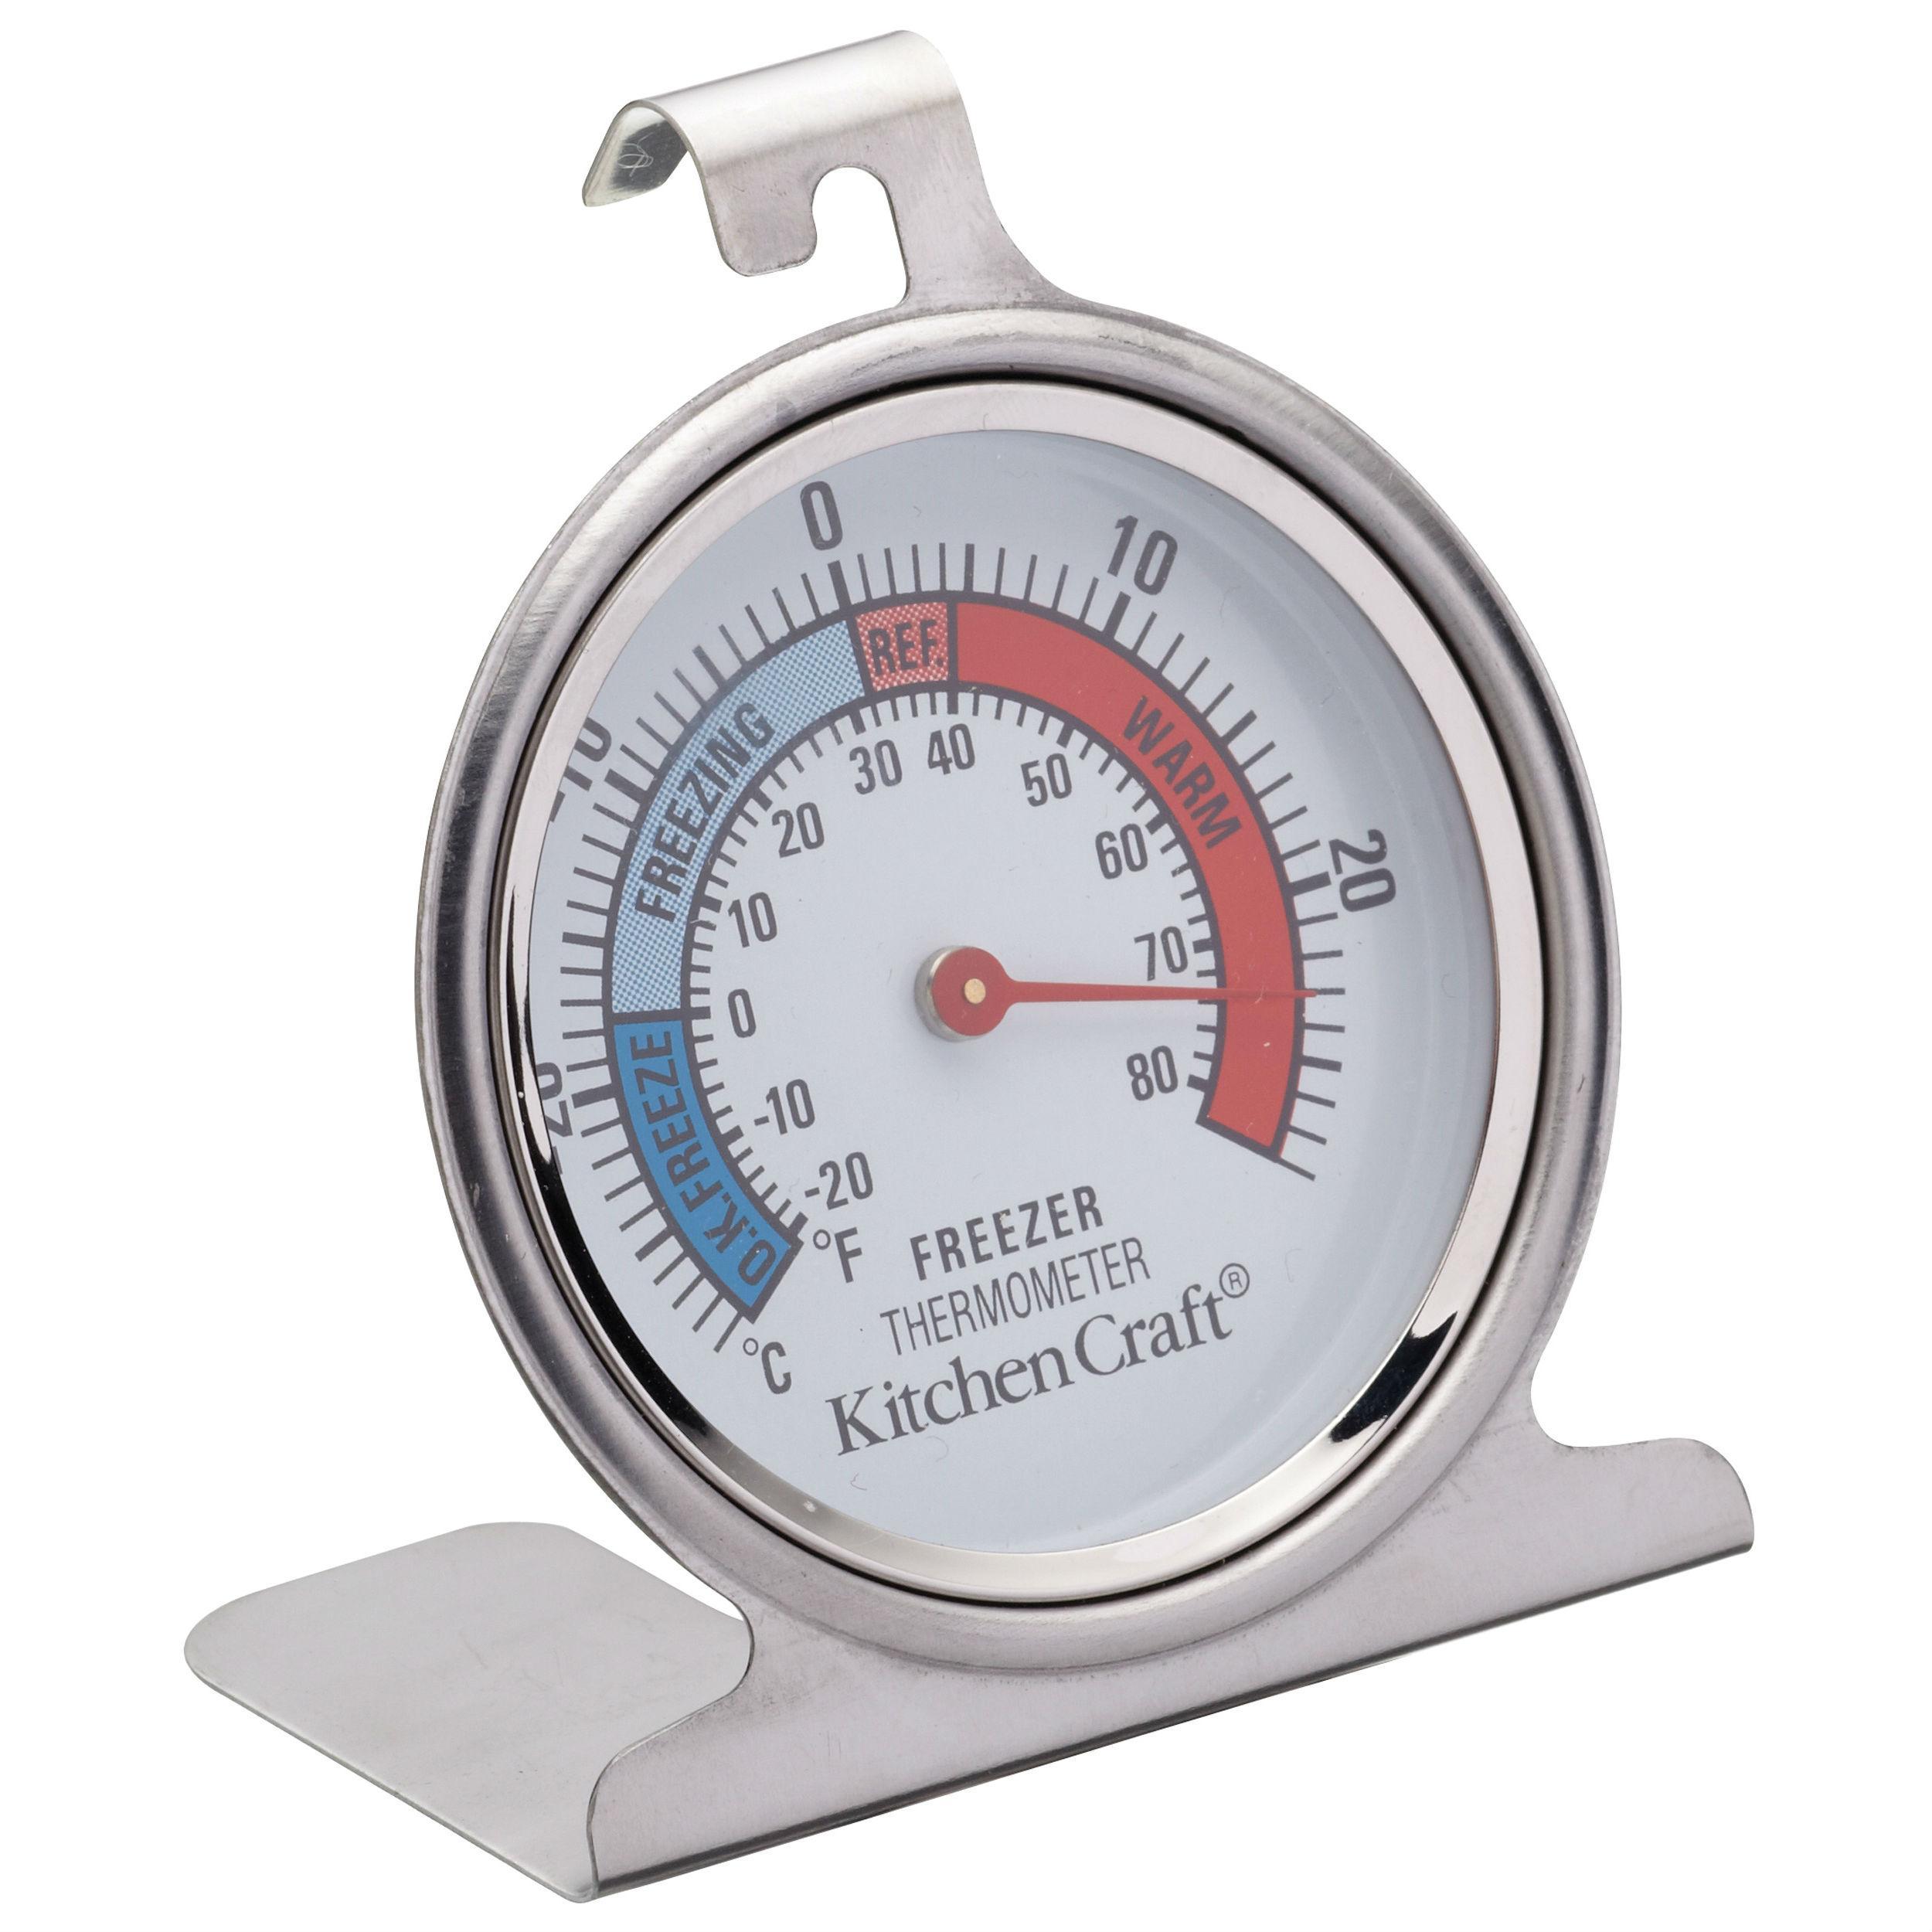 kitchencraft dial type freezer fridge thermometer. Black Bedroom Furniture Sets. Home Design Ideas